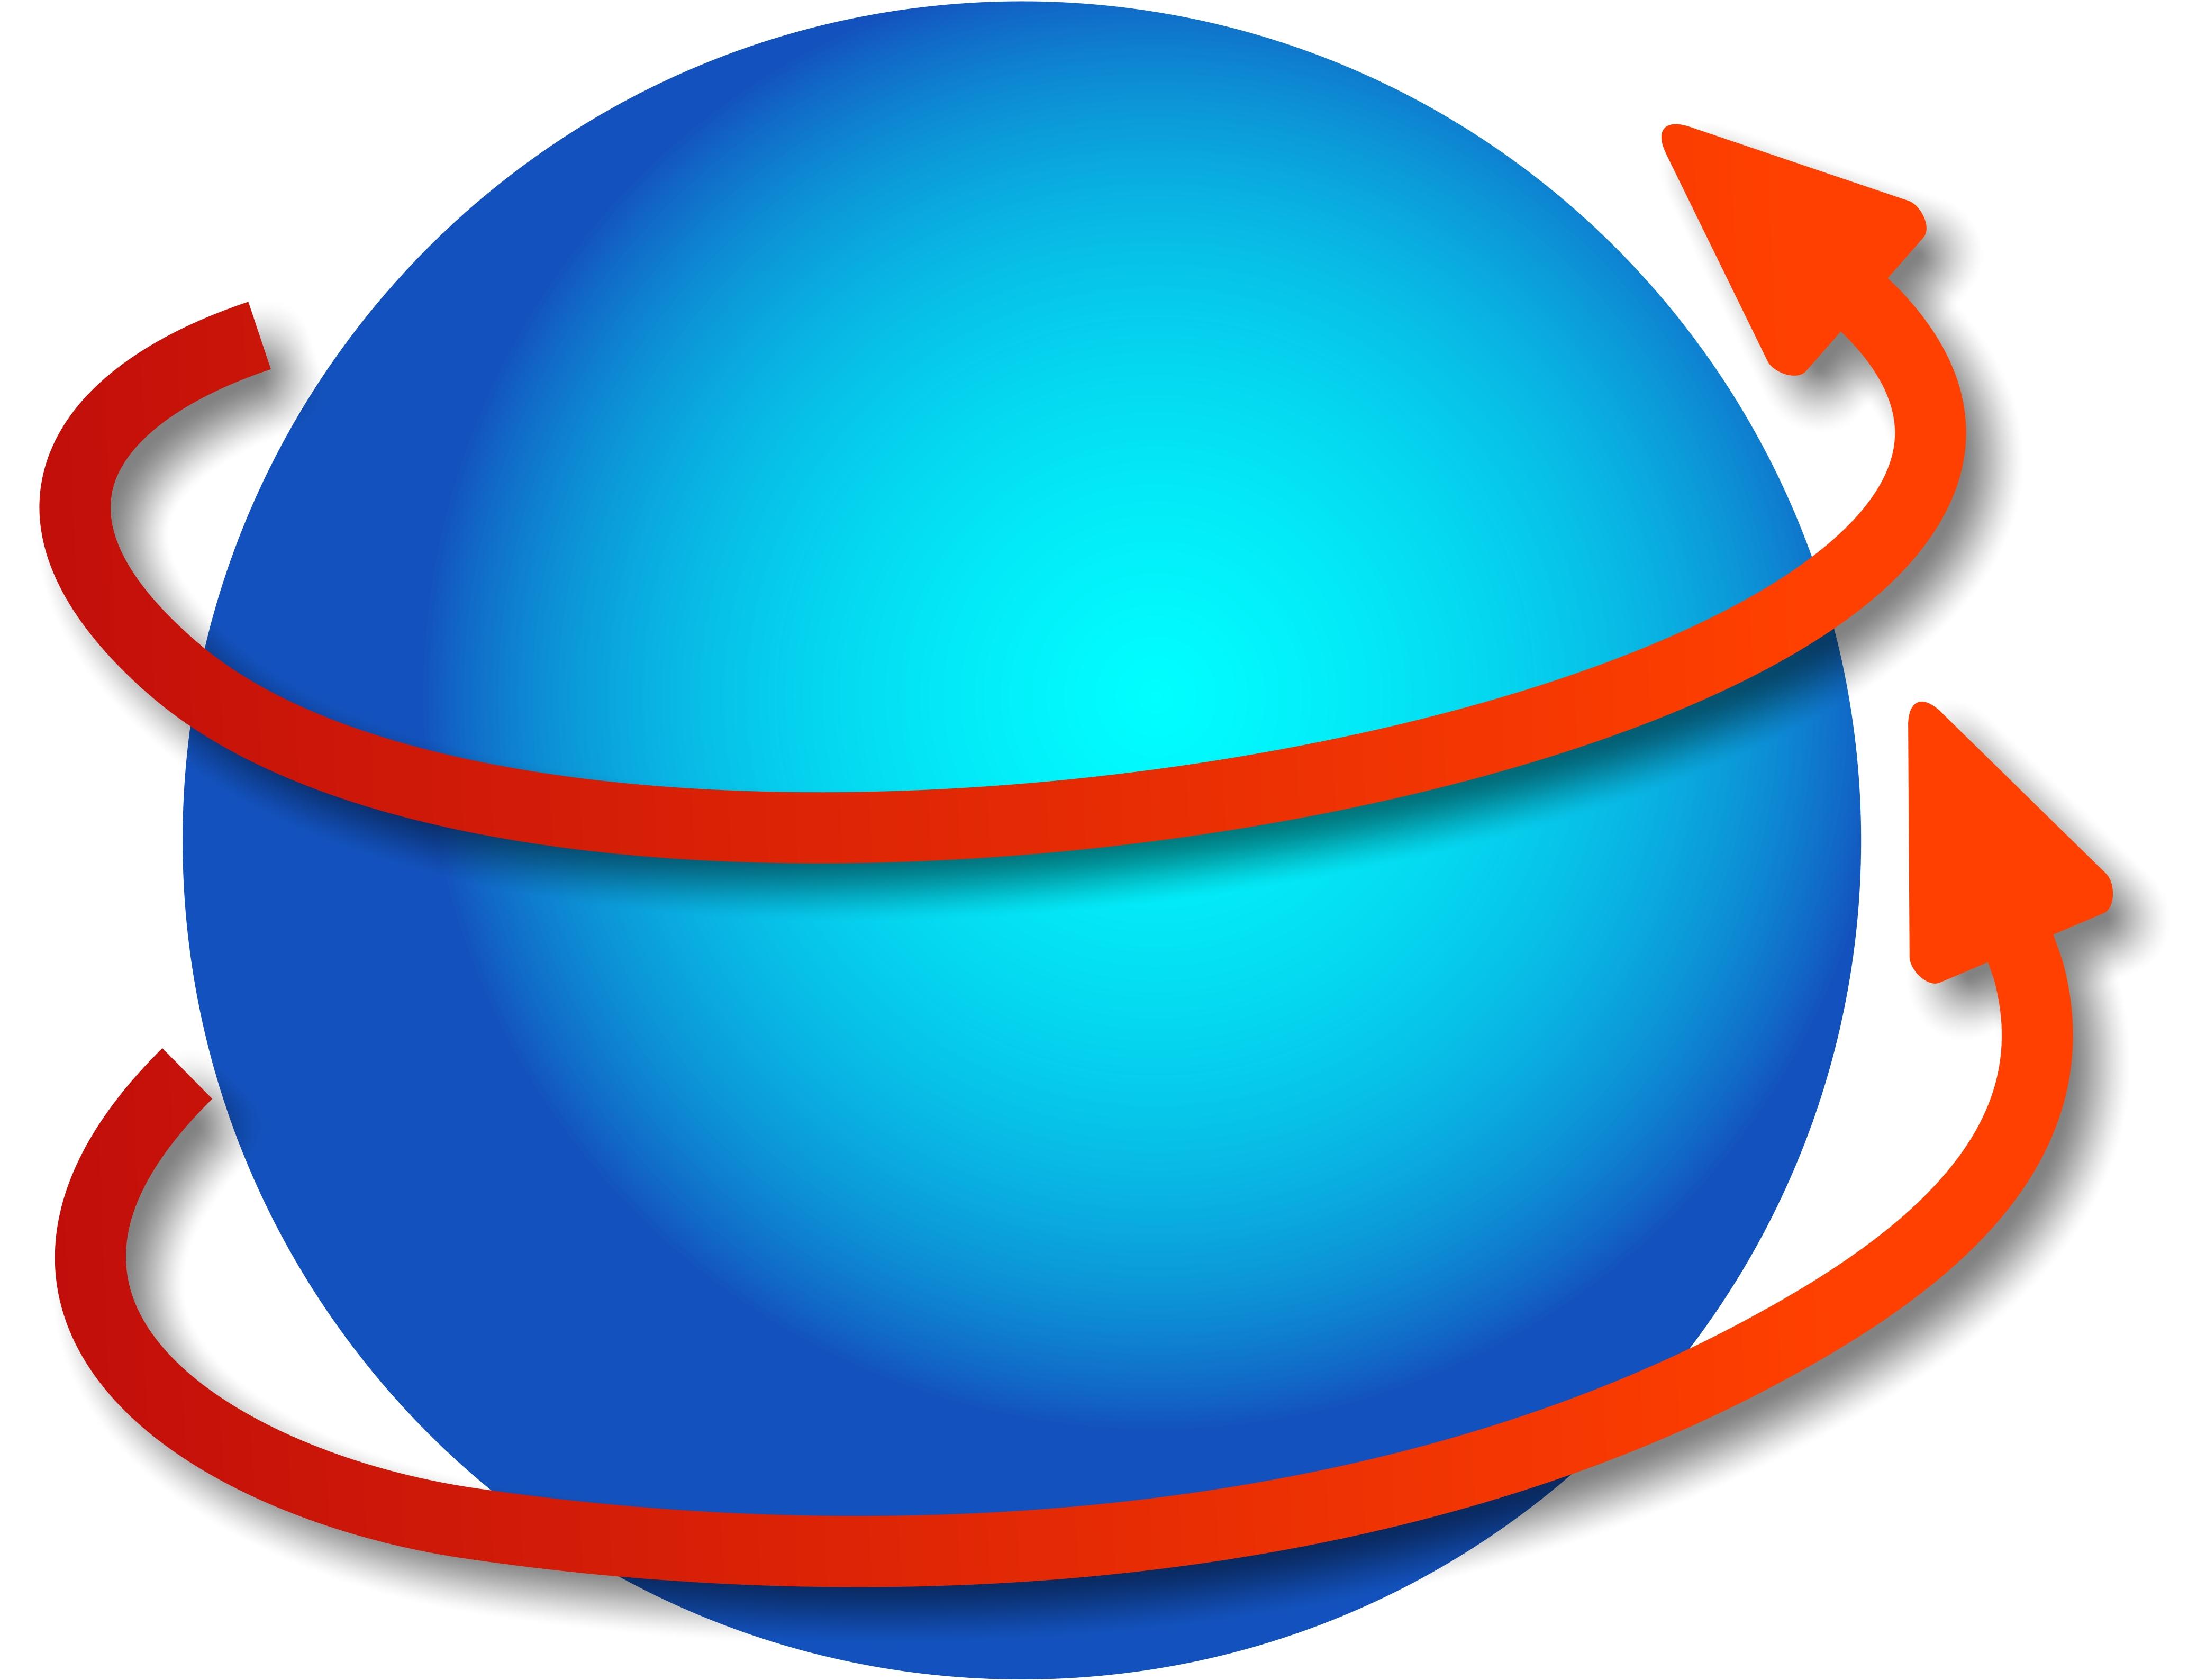 spinning globe clip art animation - photo #49